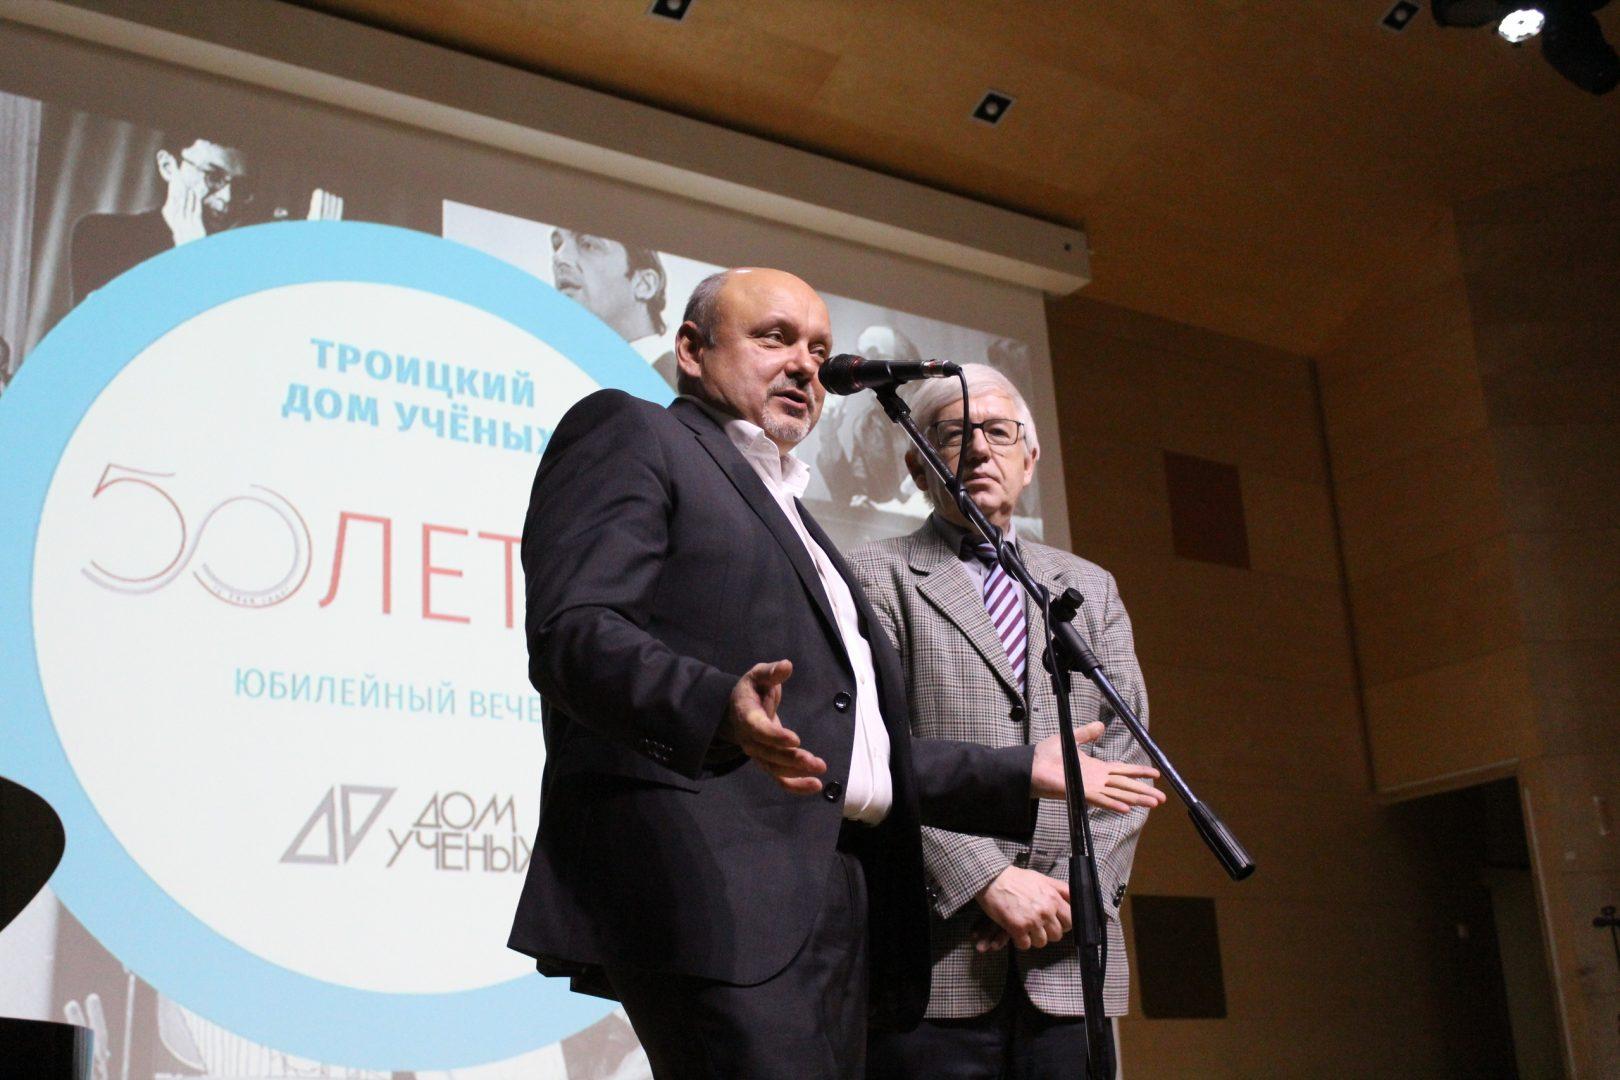 Владимир Дудочкин поздравляет юбиляра. Фото: Алена Антонова